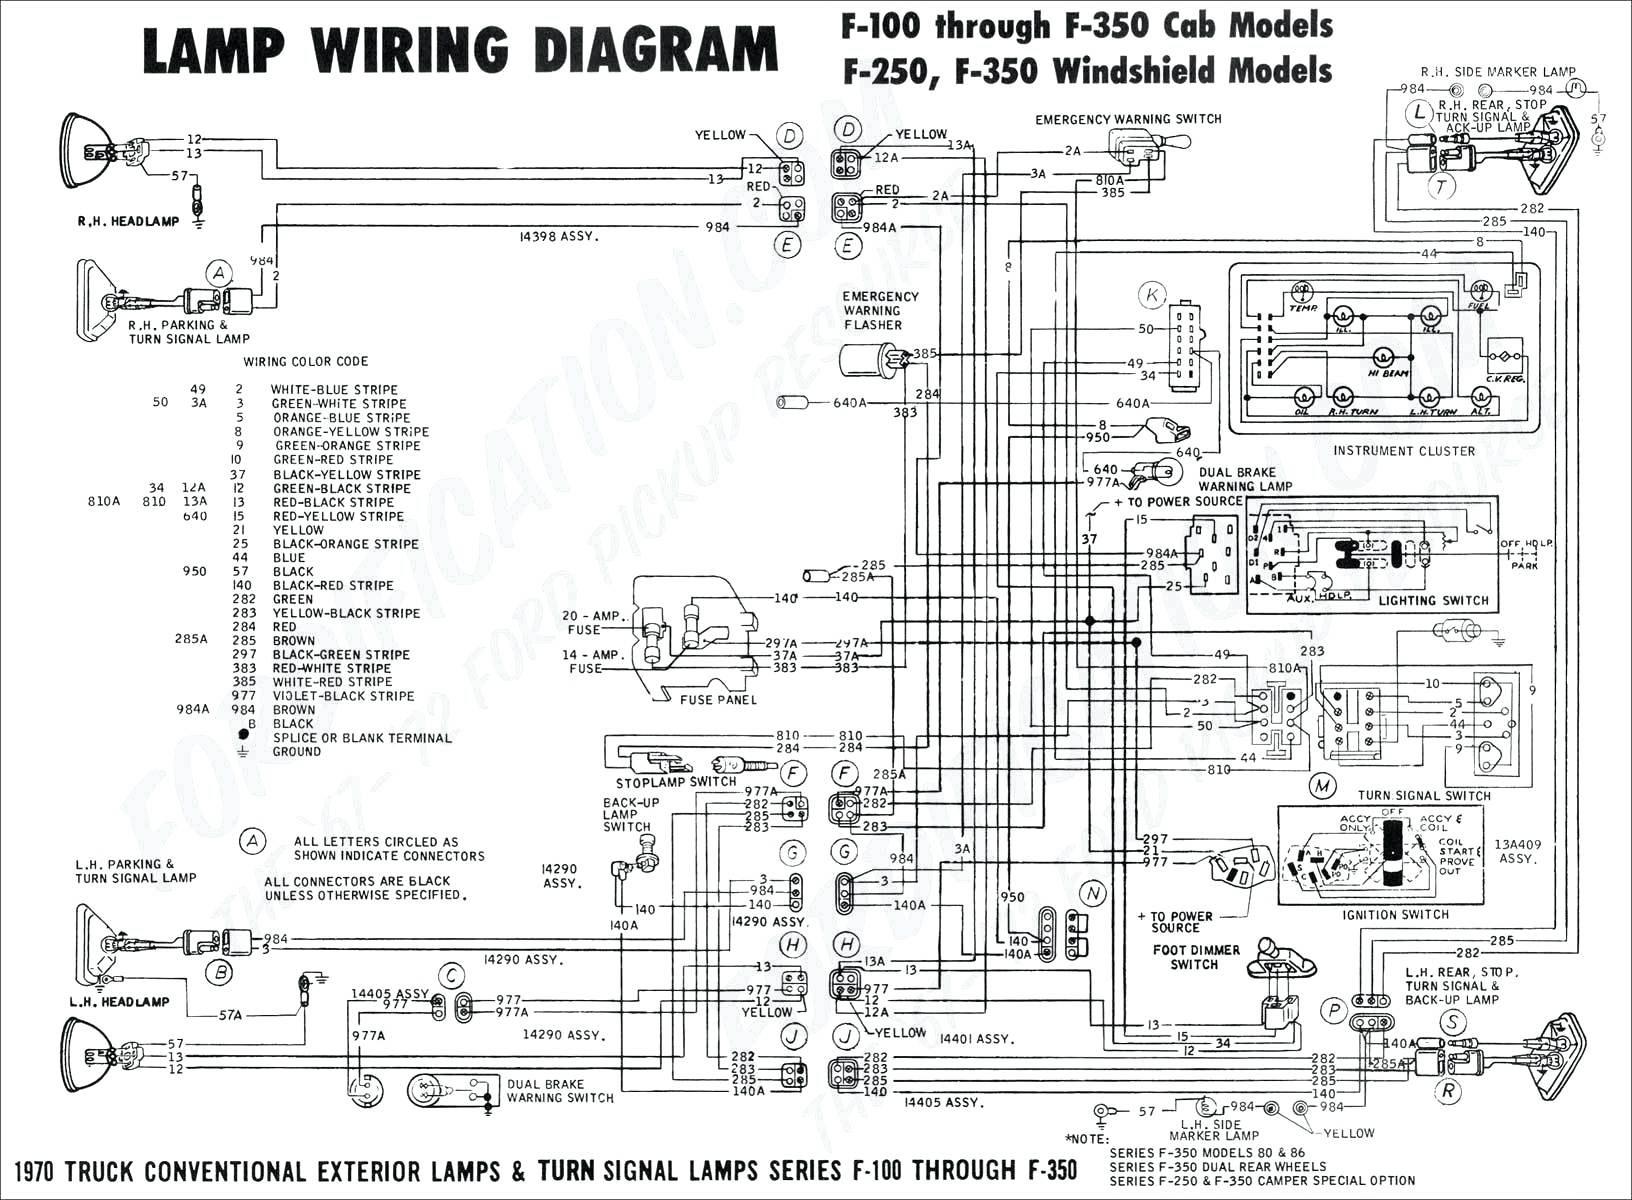 79 Dodge Truck Wiring Diagram - 89 Jeep Wrangler Wiring Diagram -  diagramford.2014ok.jeanjaures37.frWiring Diagram Resource